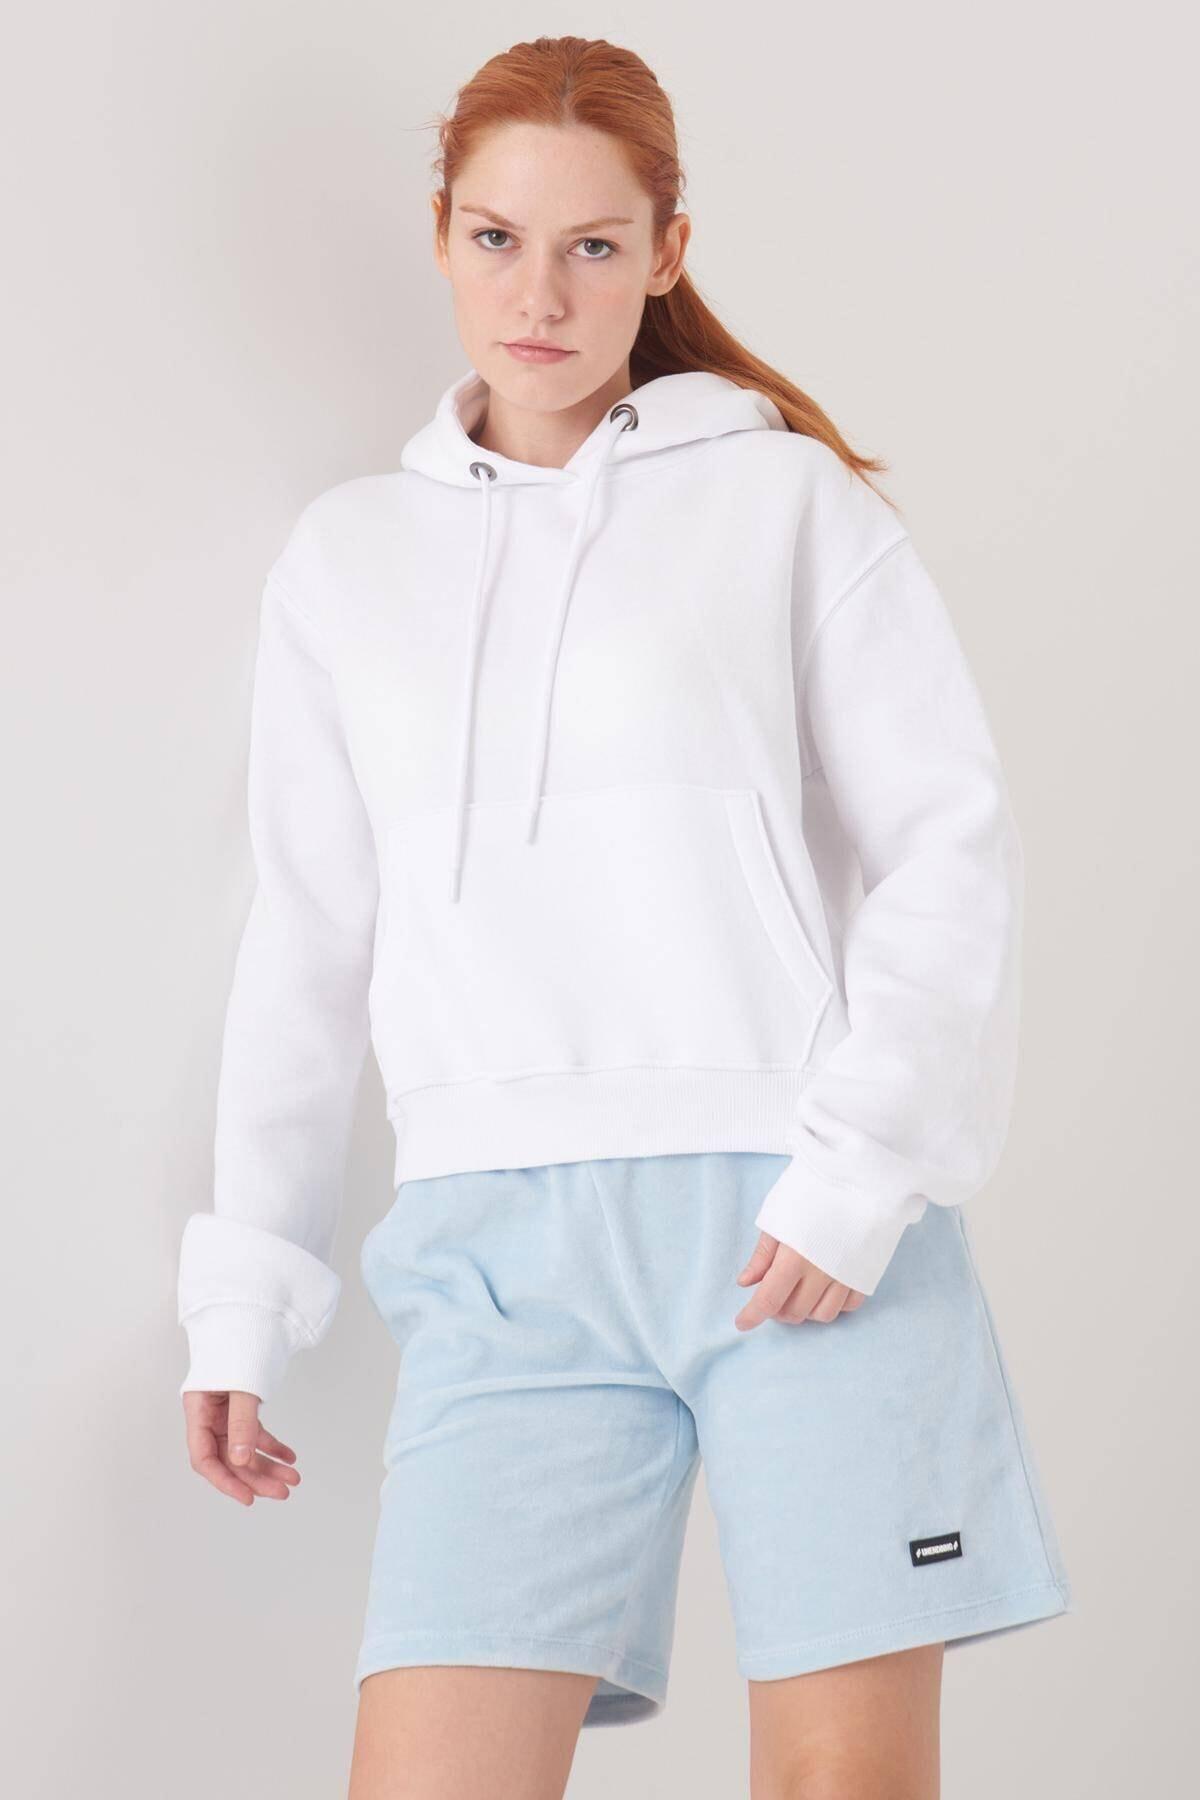 Addax Kadın Beyaz Cep Detaylı Sweat S0818 - F11 ADX-0000021306 1